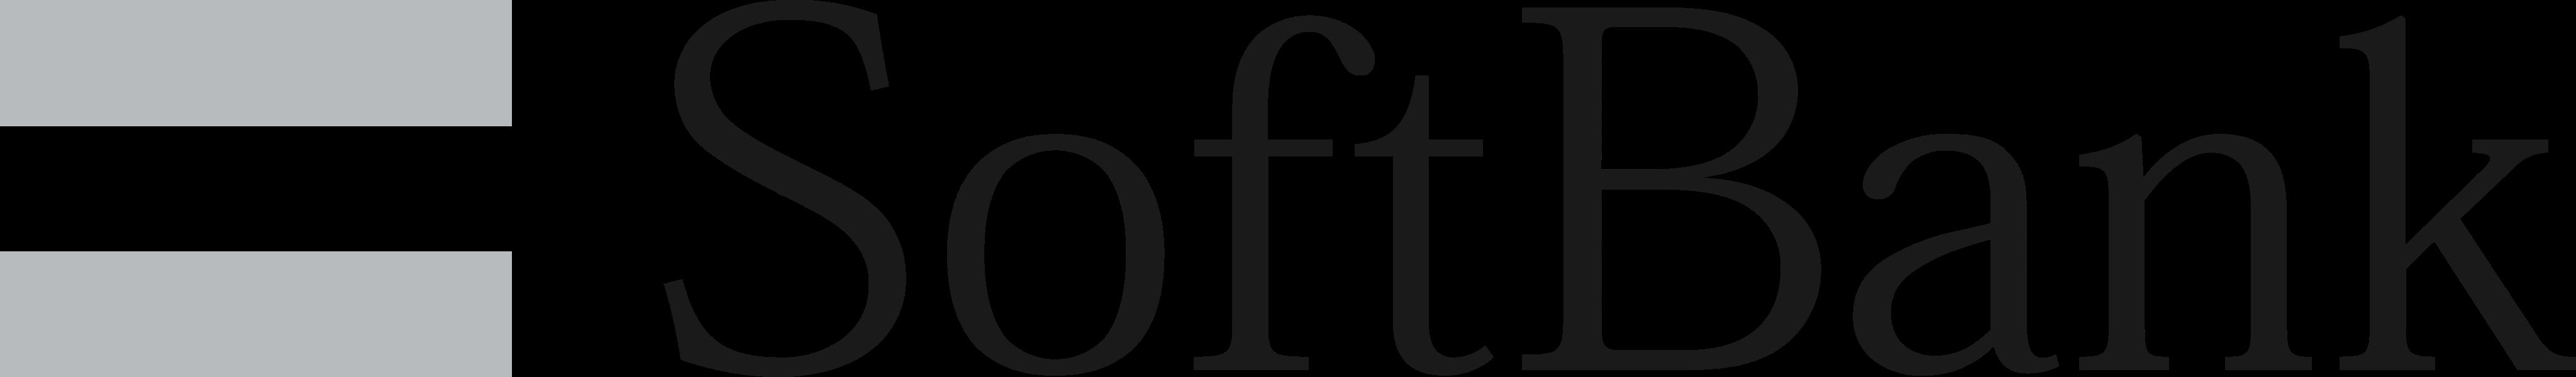 softbank logo - SoftBank Logo